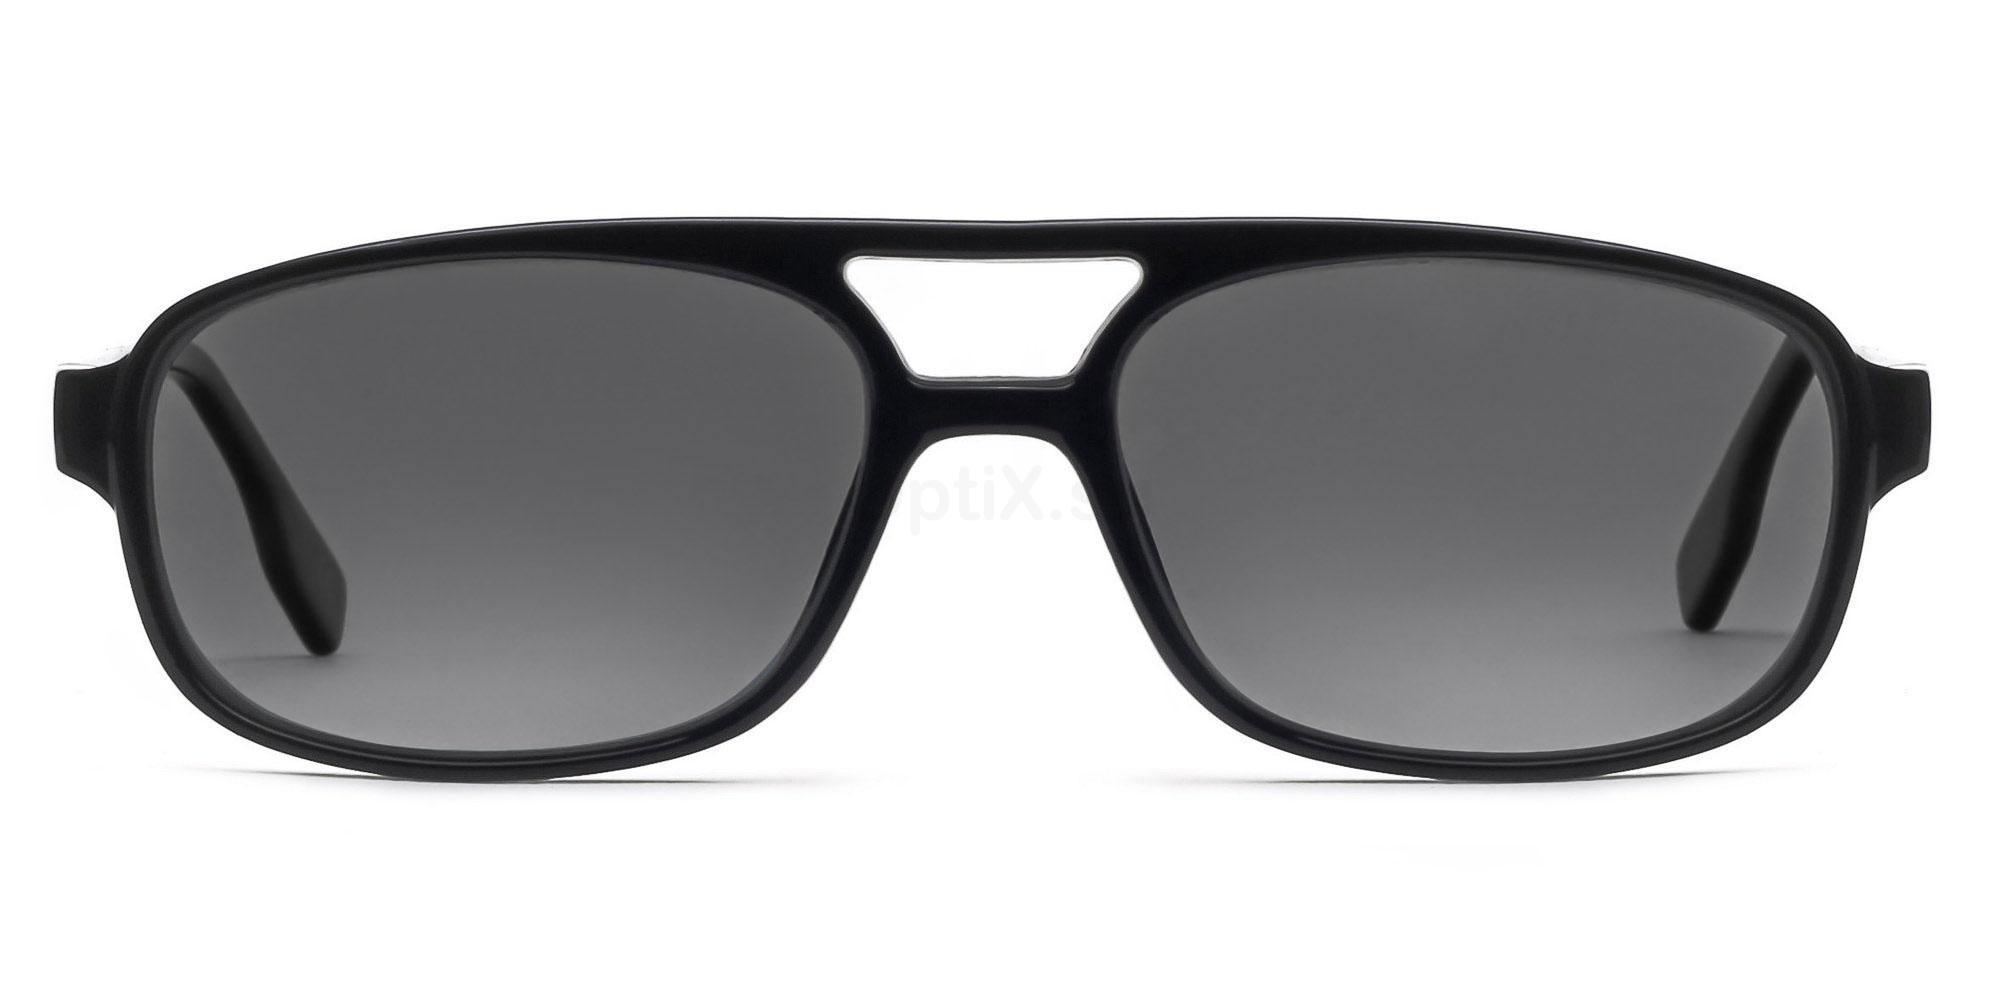 C01 Polarized Grey P2395 - Black (Polarized) , Savannah